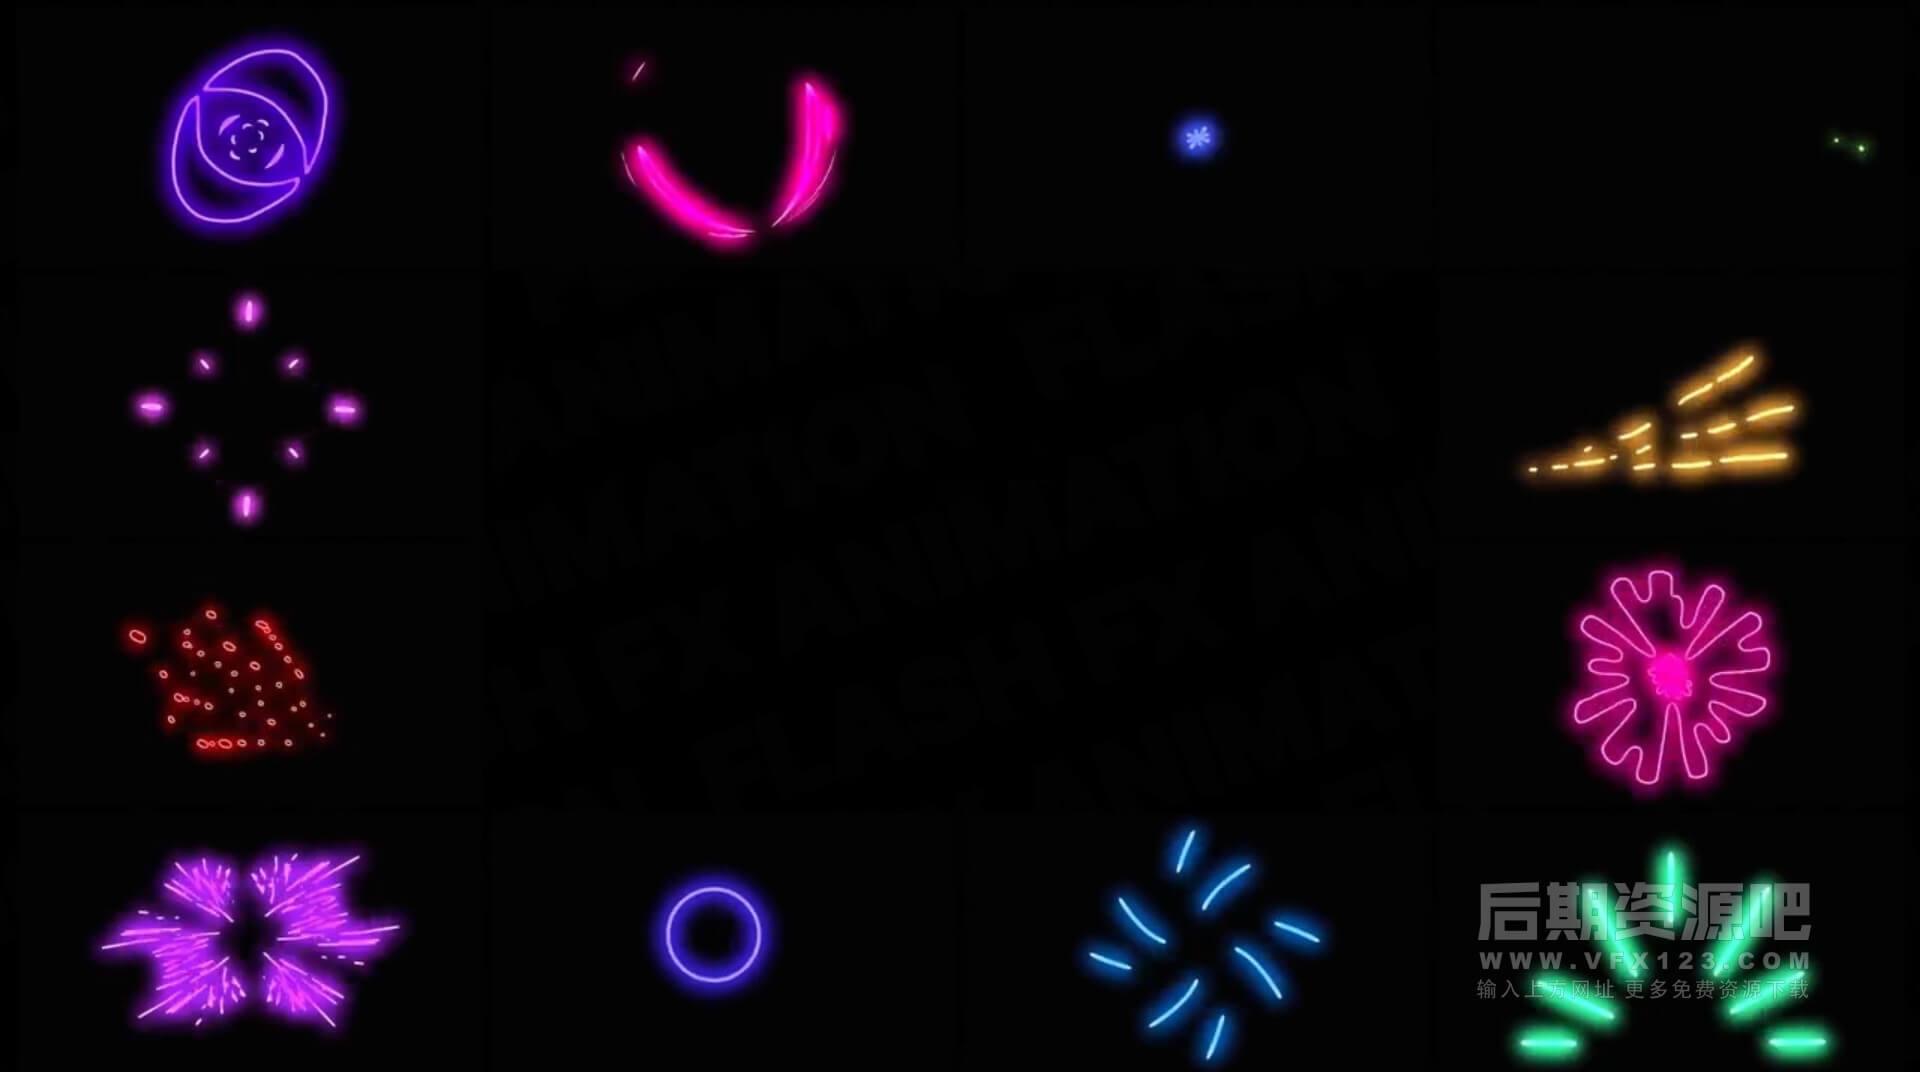 FCPX插件 霓虹灯发光手绘闪烁效果动画元素 Neon Generators